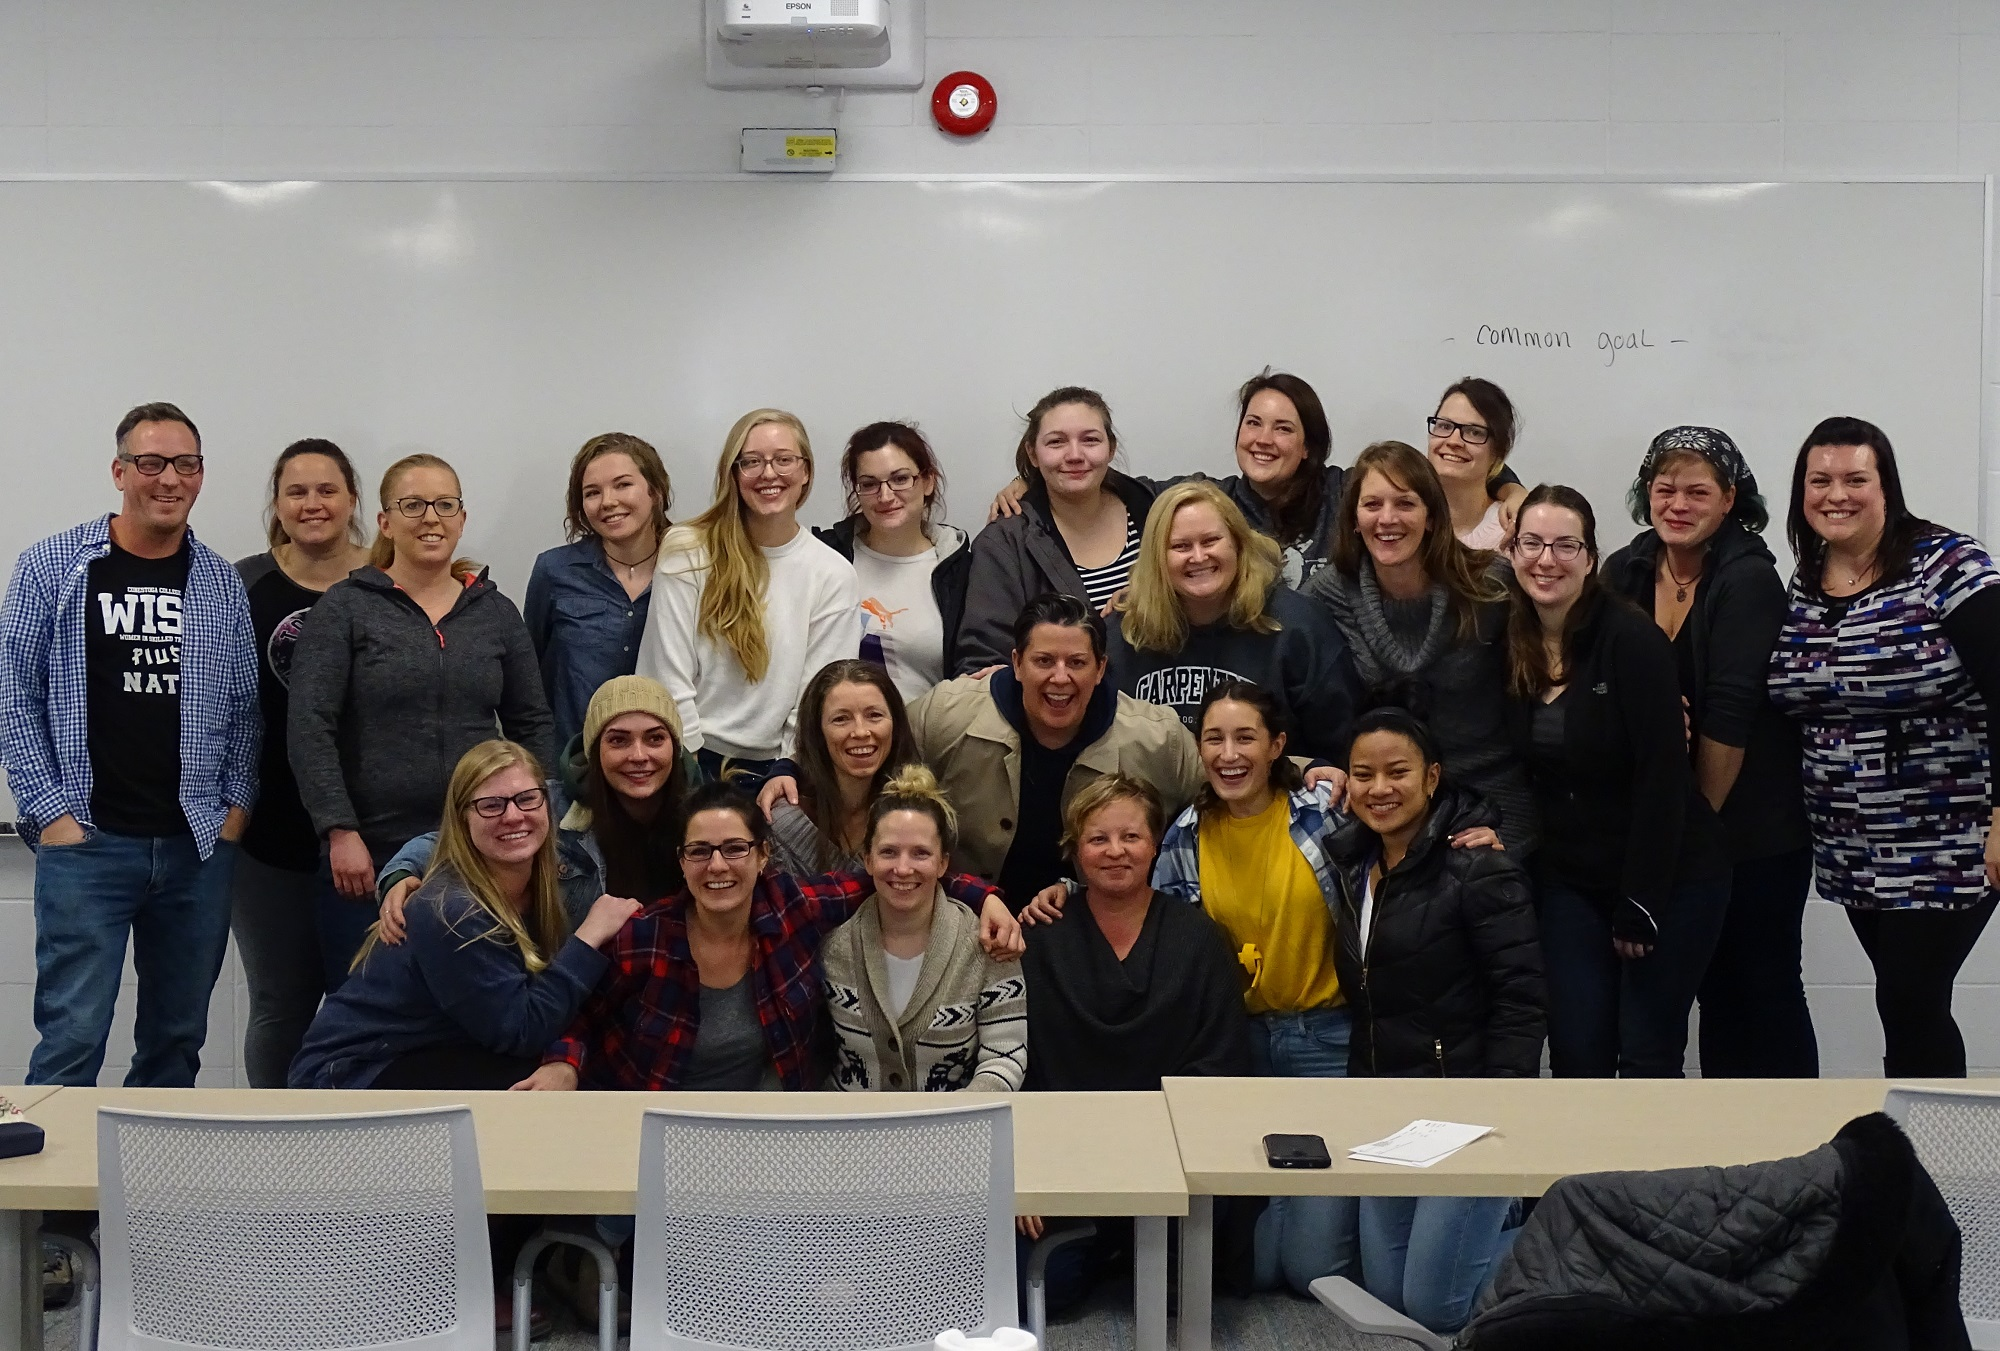 Conestoga College - Mandy Rennehan 2018.jpg